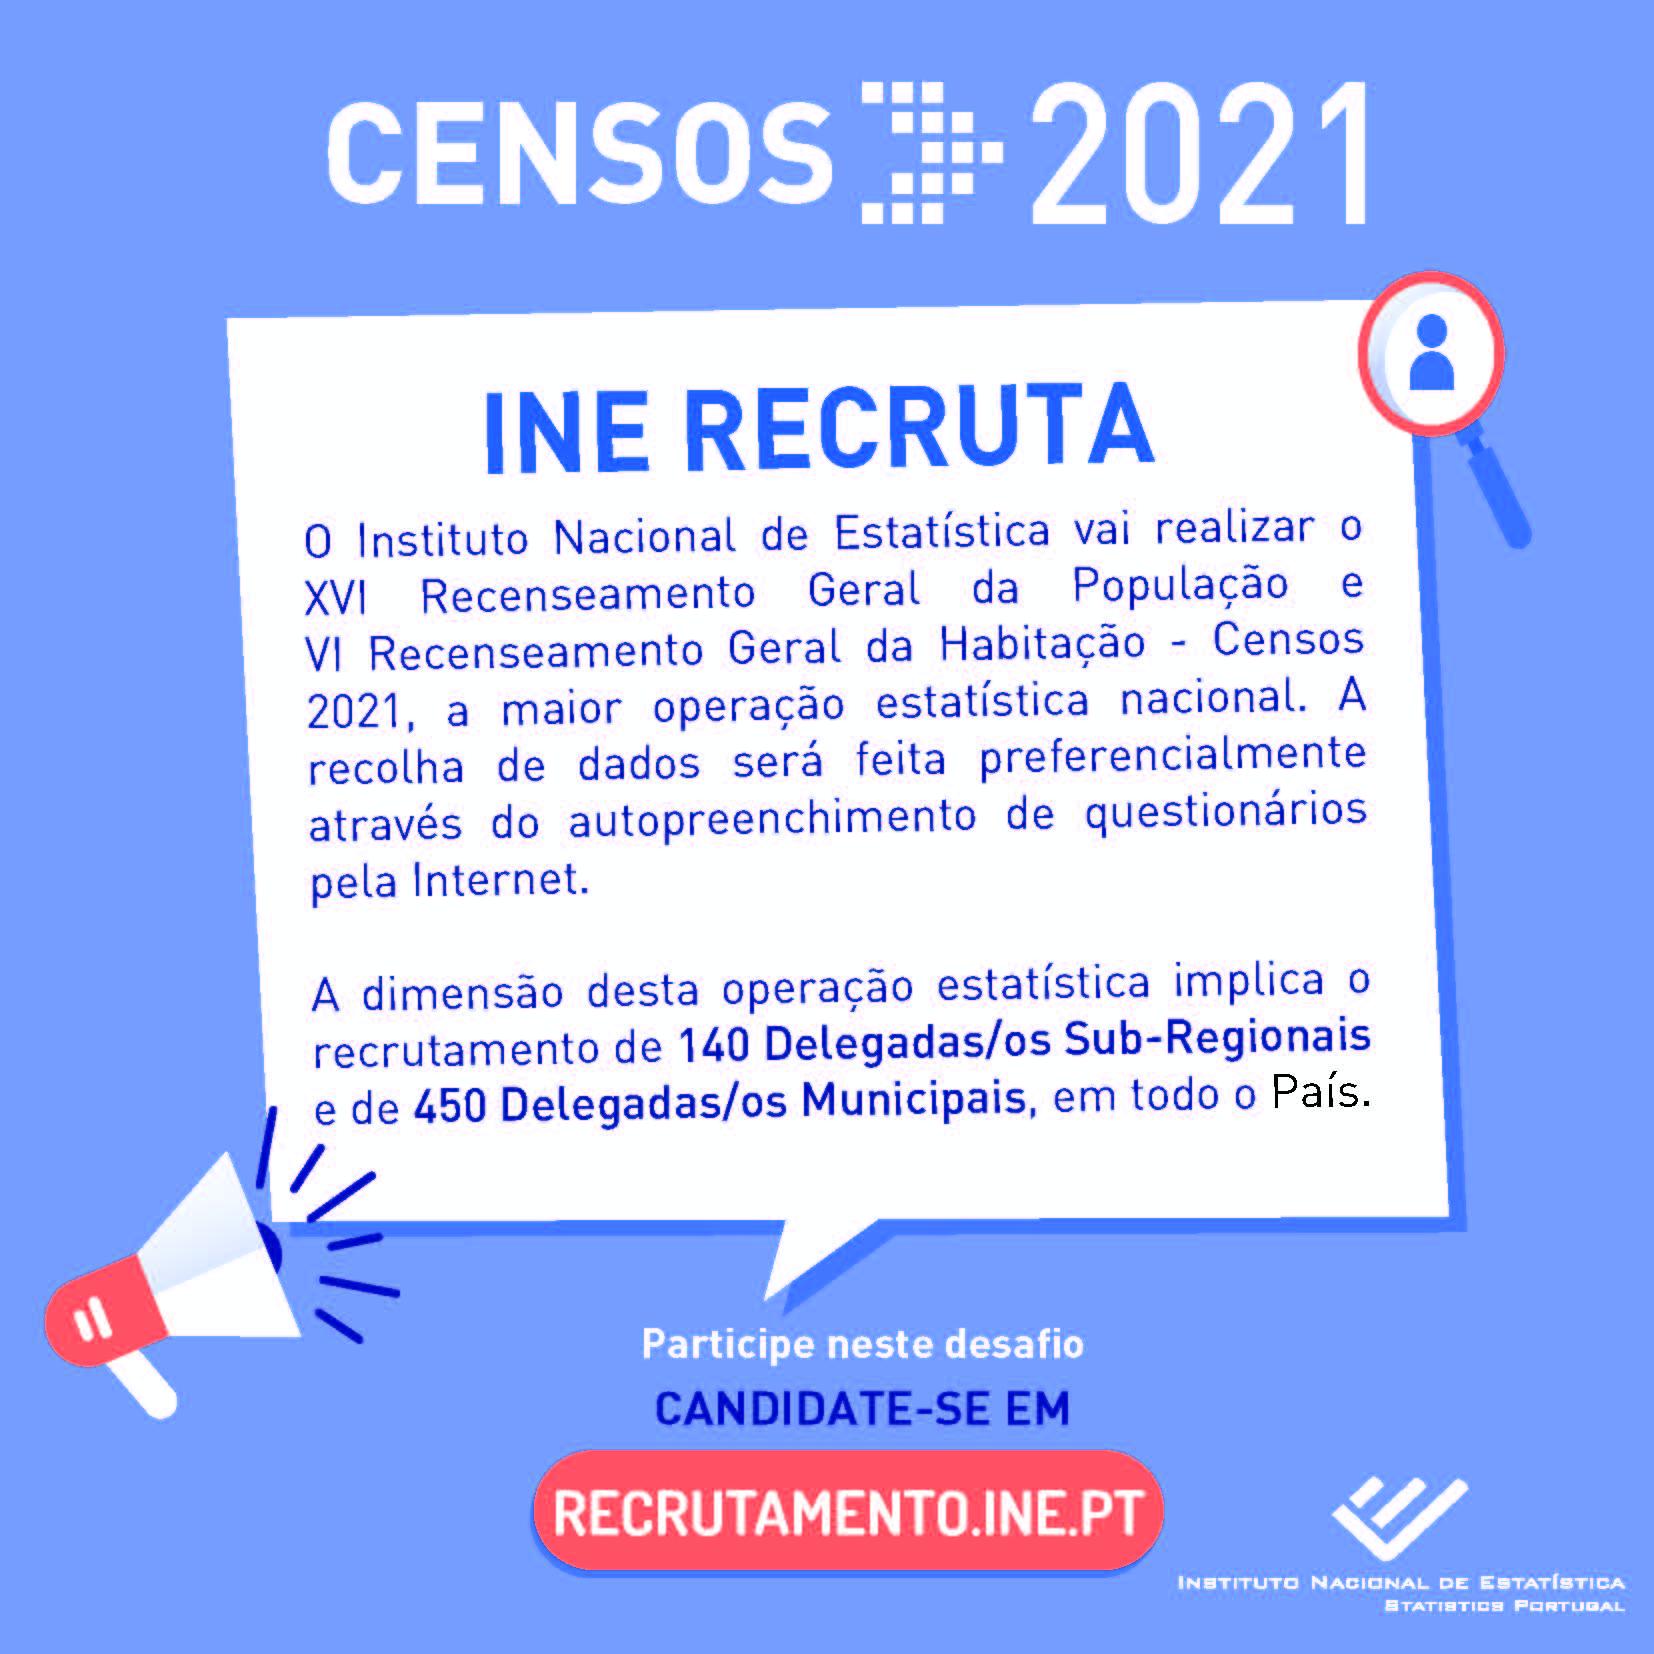 CENSOS 2021 – Recrutamento